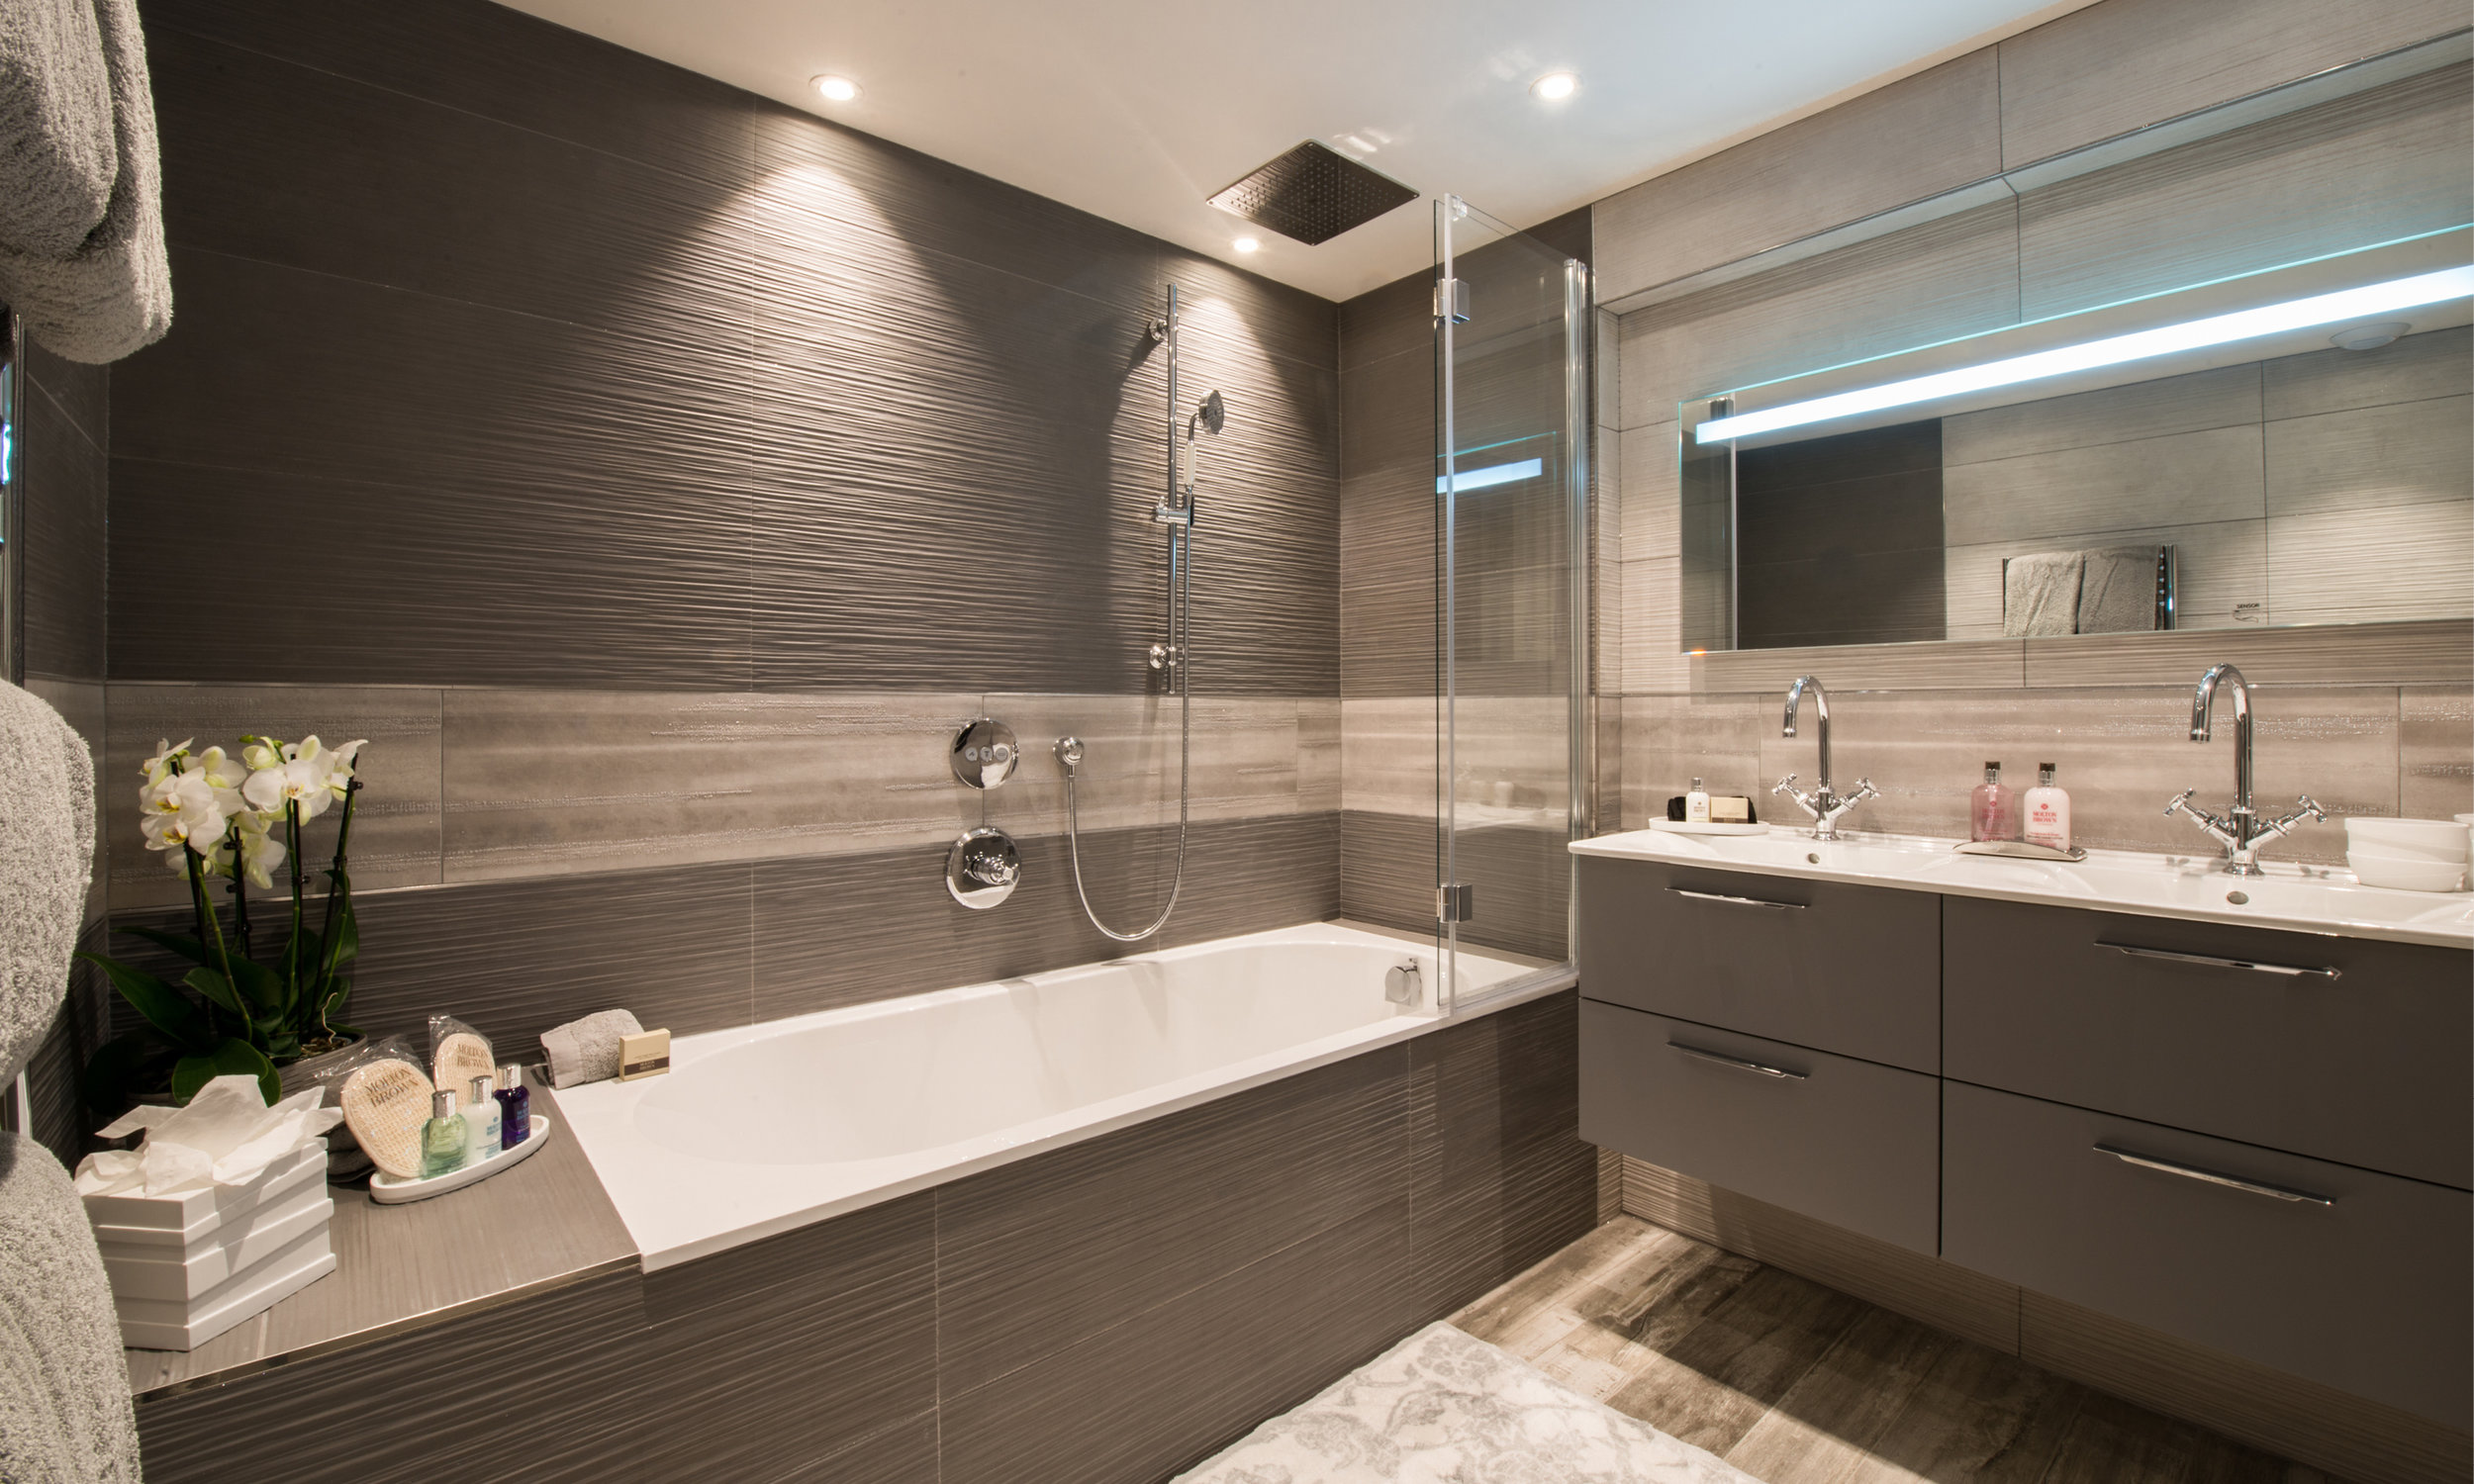 Courchevel Luxury rental baths deluxe